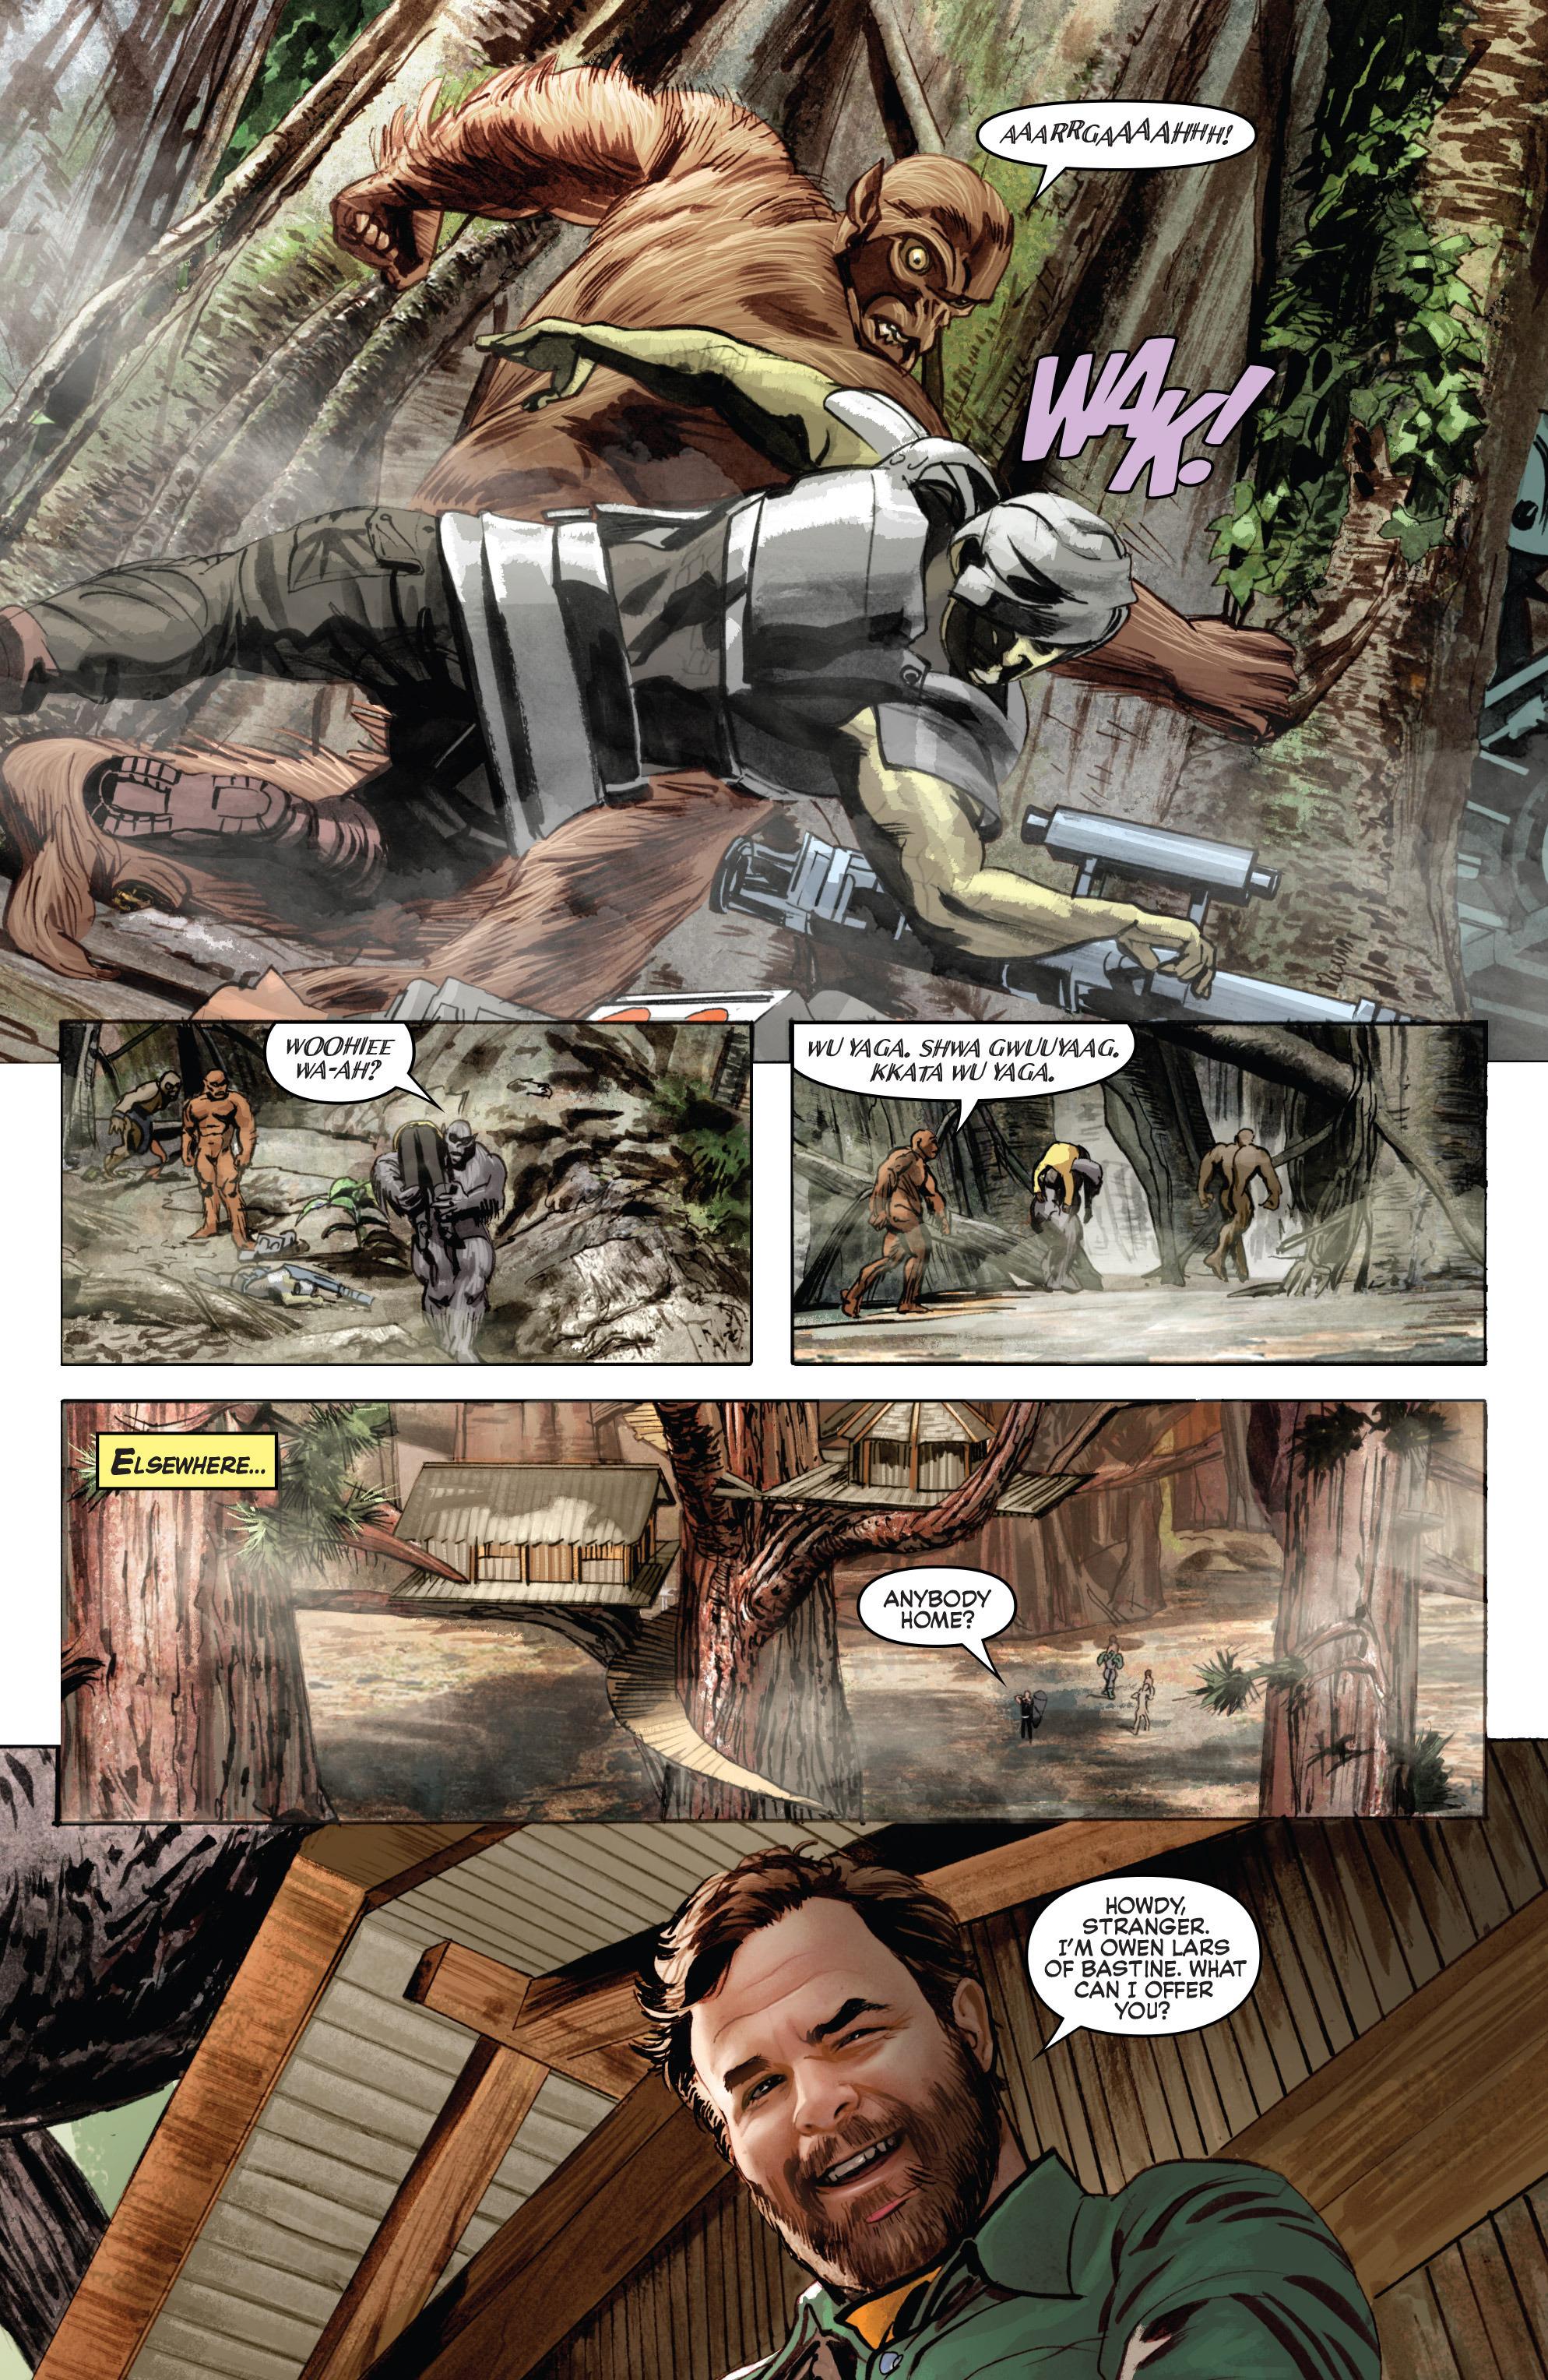 THE STAR WARS comic (2015, Marvel edition) Vol.7 19